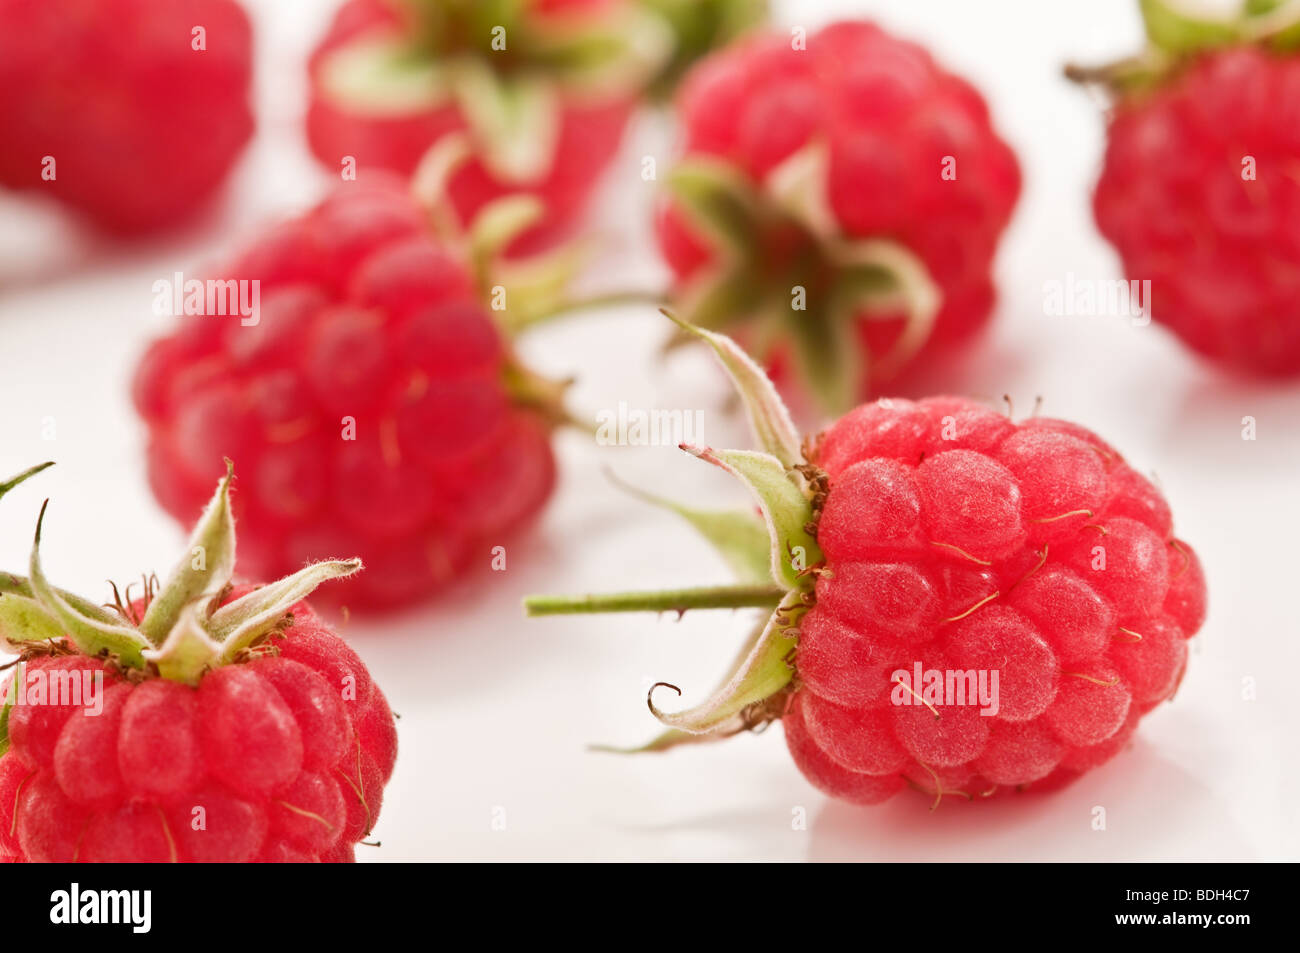 red raspberry closeup - Stock Image